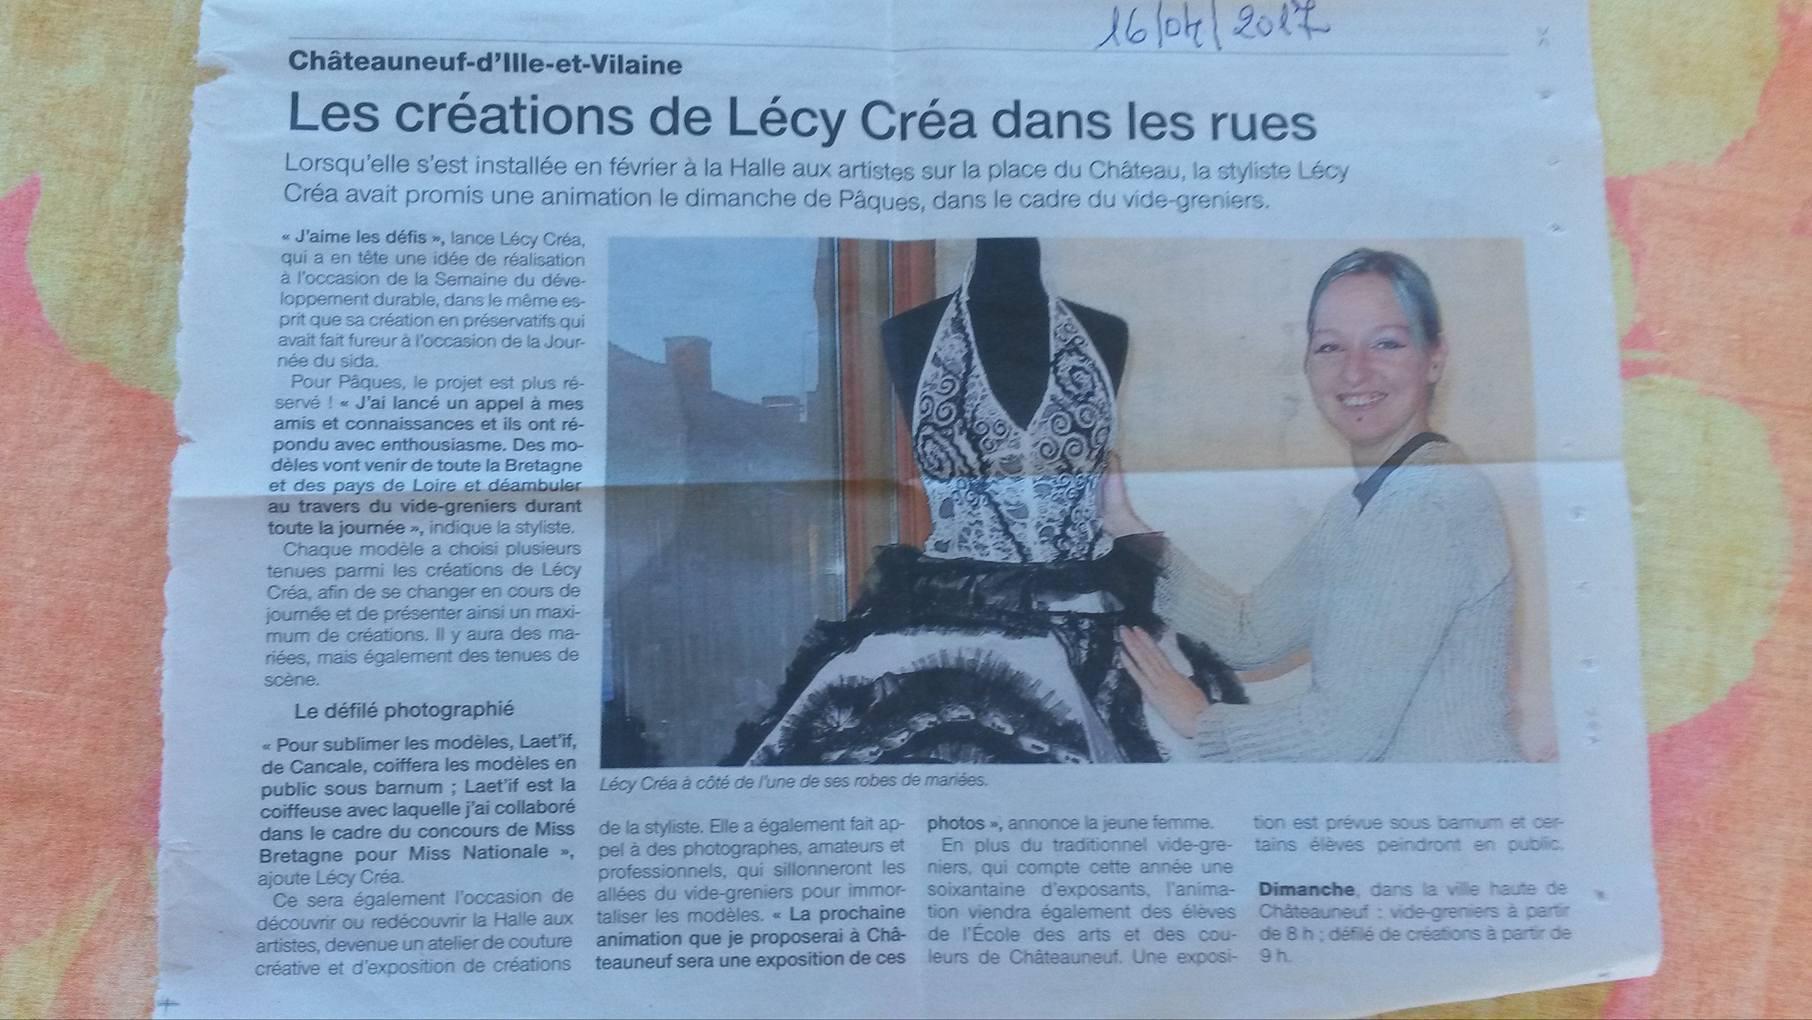 lecy-crea-styliste-chateauneuf-35-créatrice-robe-de-mariee.jpg